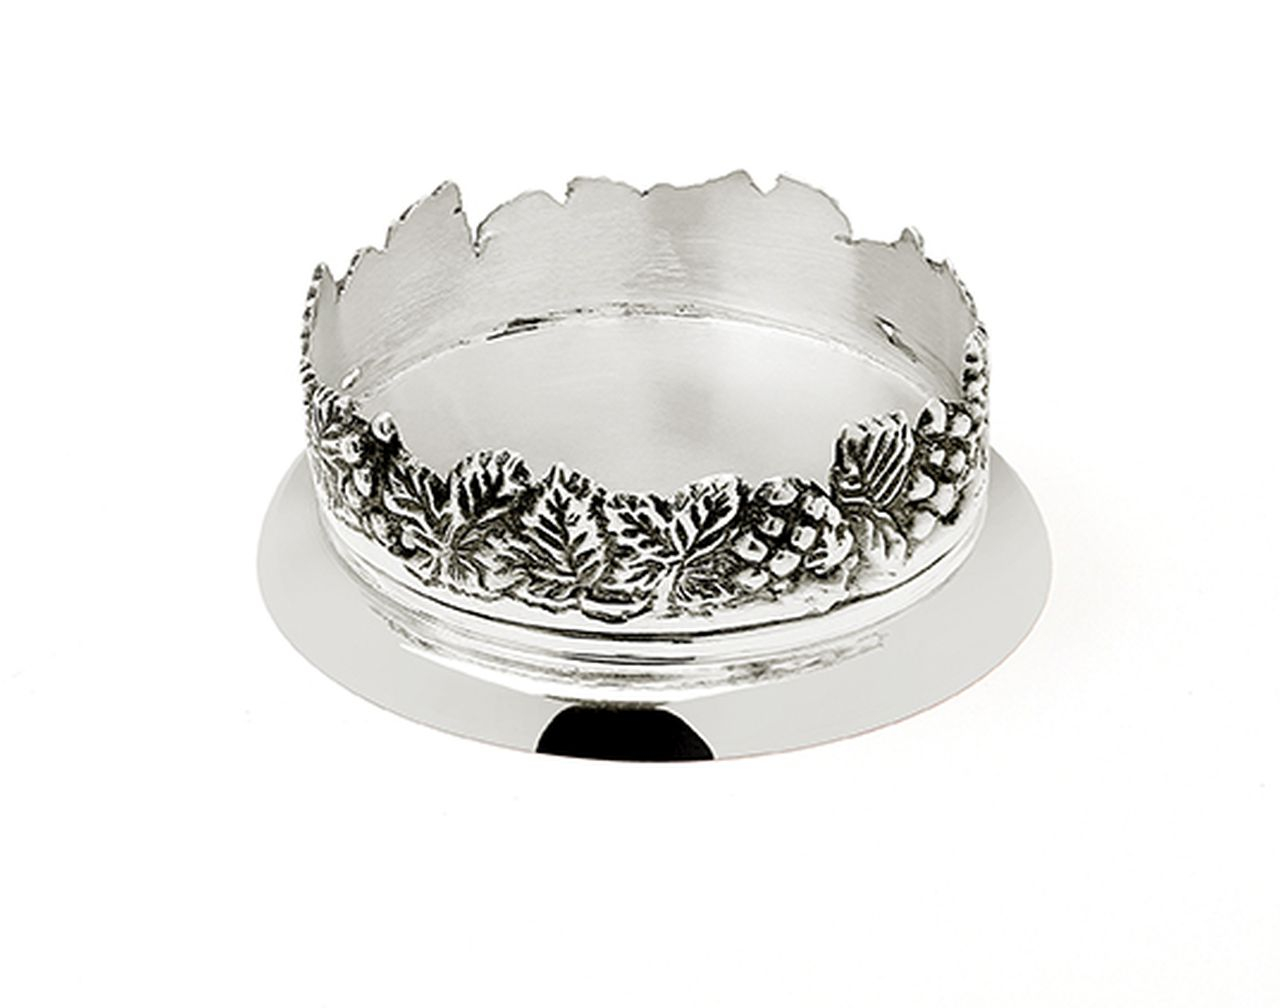 Sottobicchire placcato argento sheffield stile grappe cm.4h diam.11